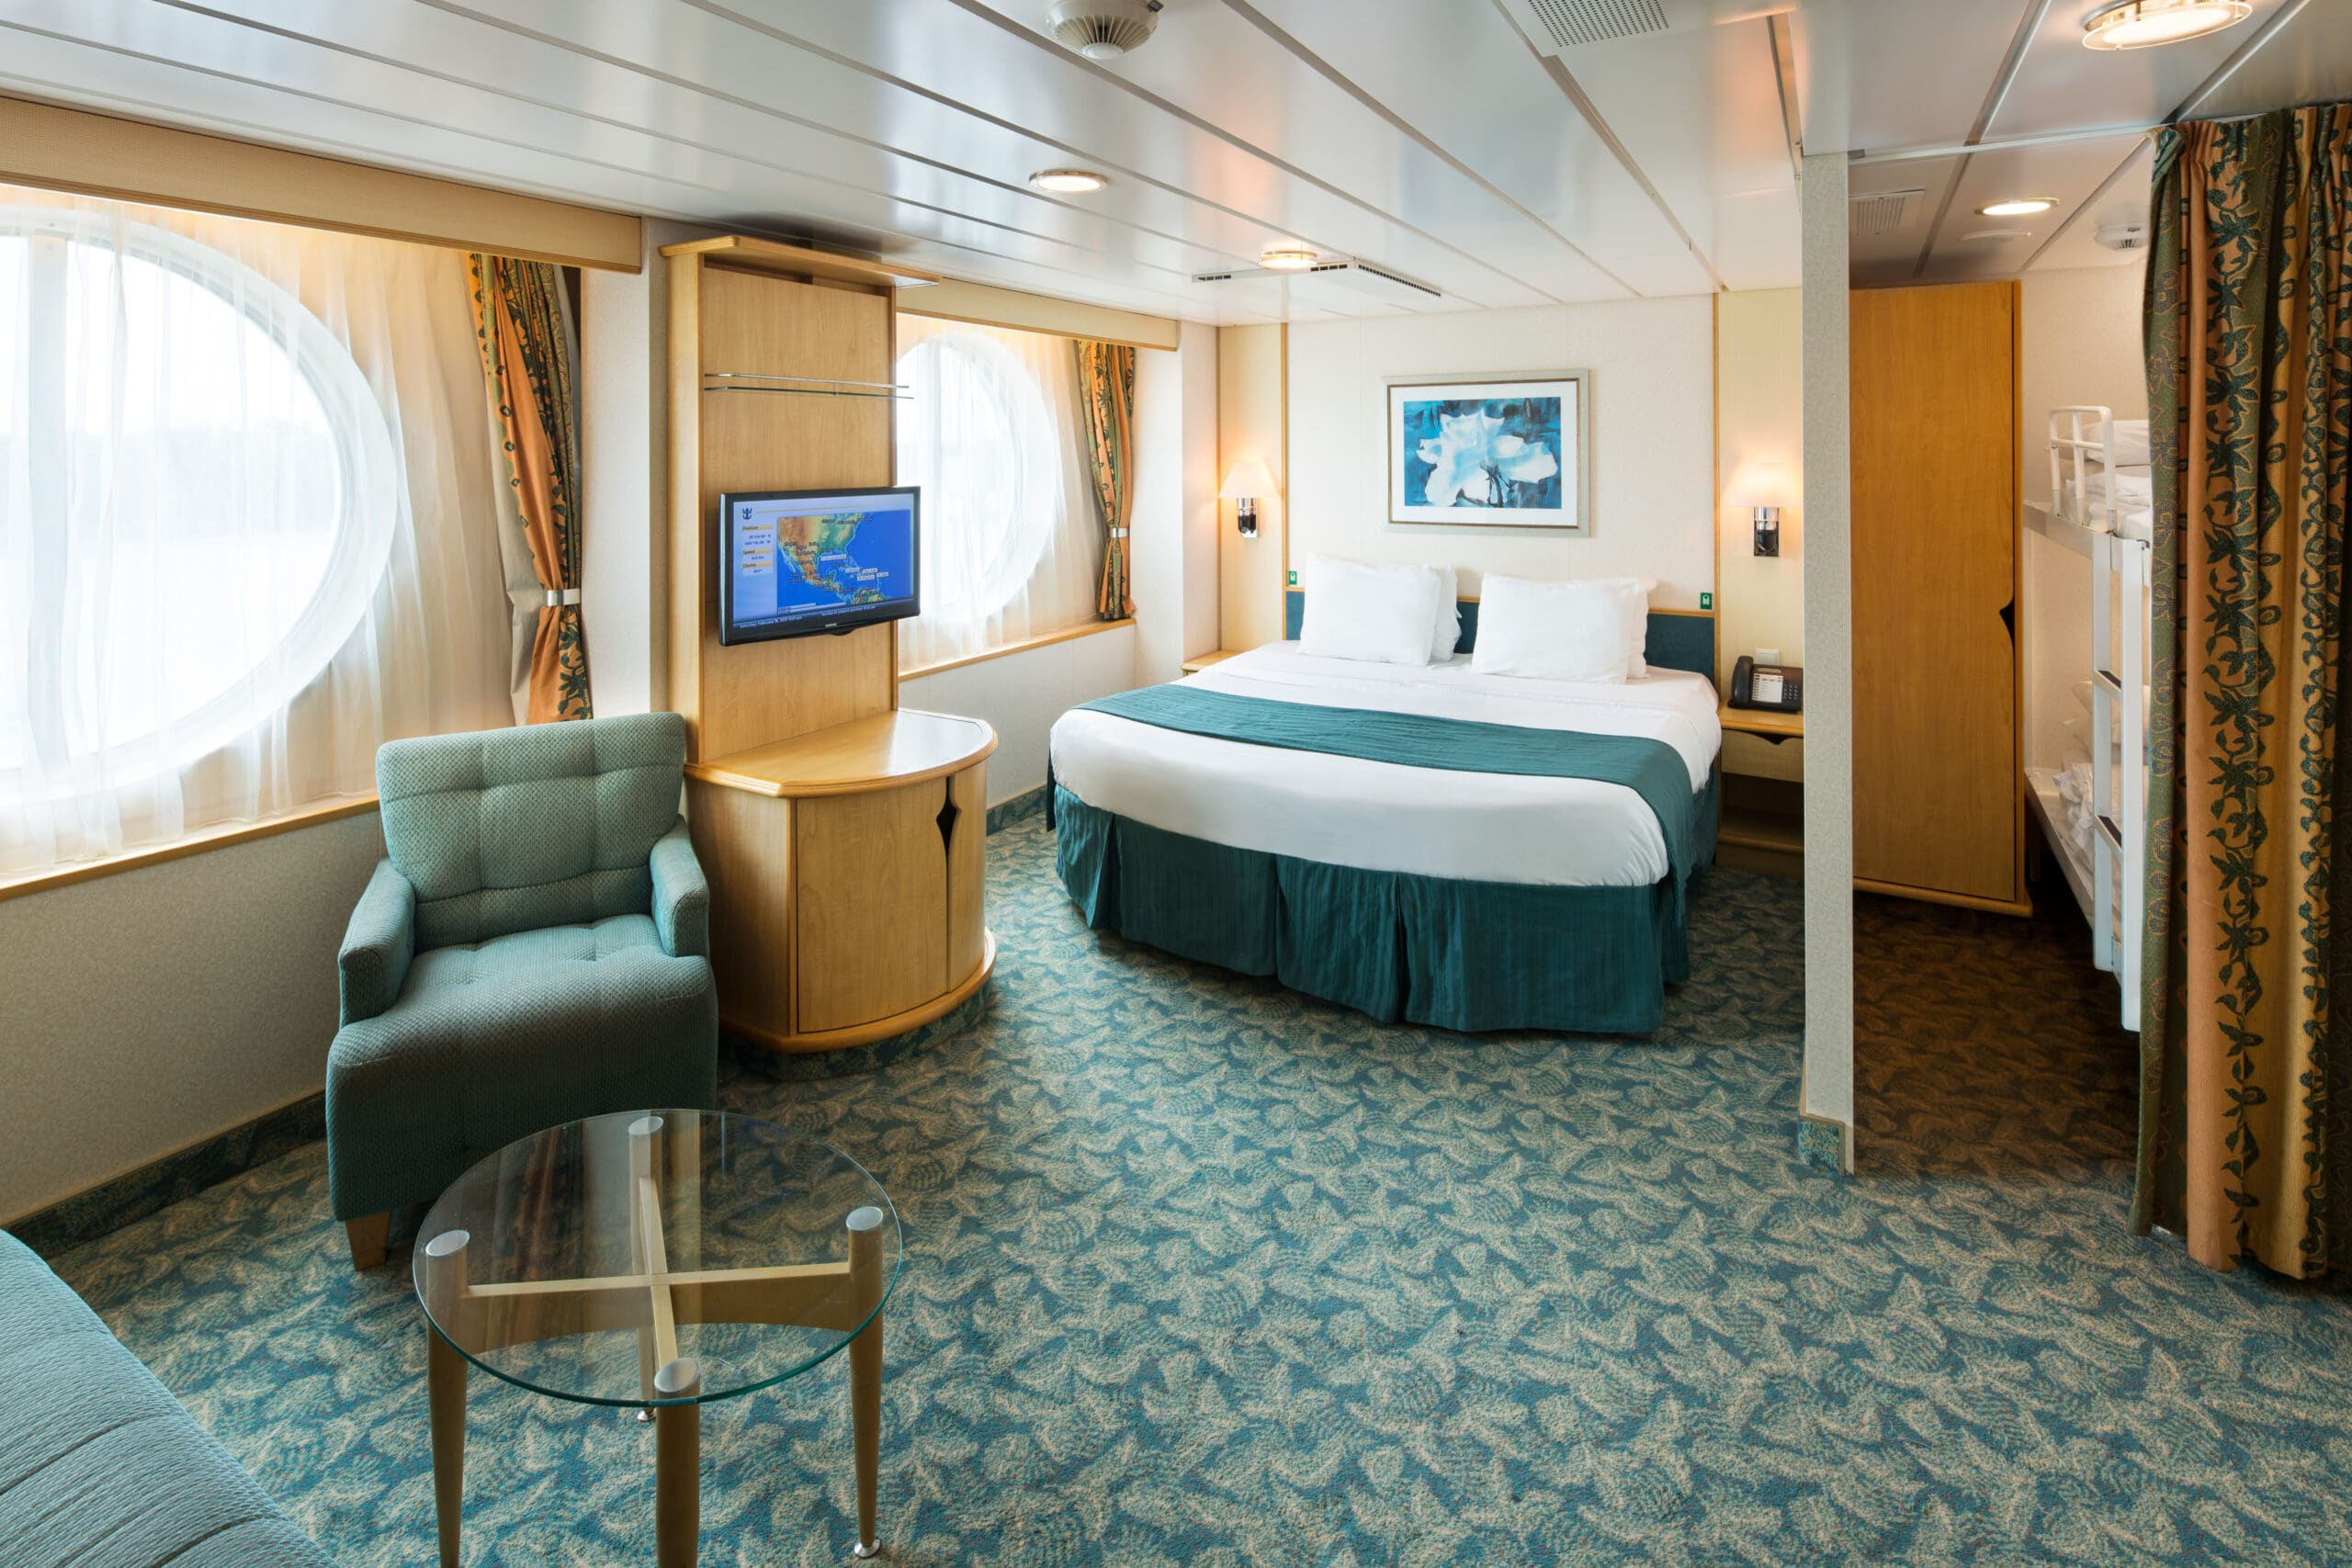 Royal-Caribbean-International-Freedom-of-the-Seas-Liberty-of-the Seas-Independence-of-the-seas-schip-cruiseschip-categorie 1K-Ultra ruime buitenhut